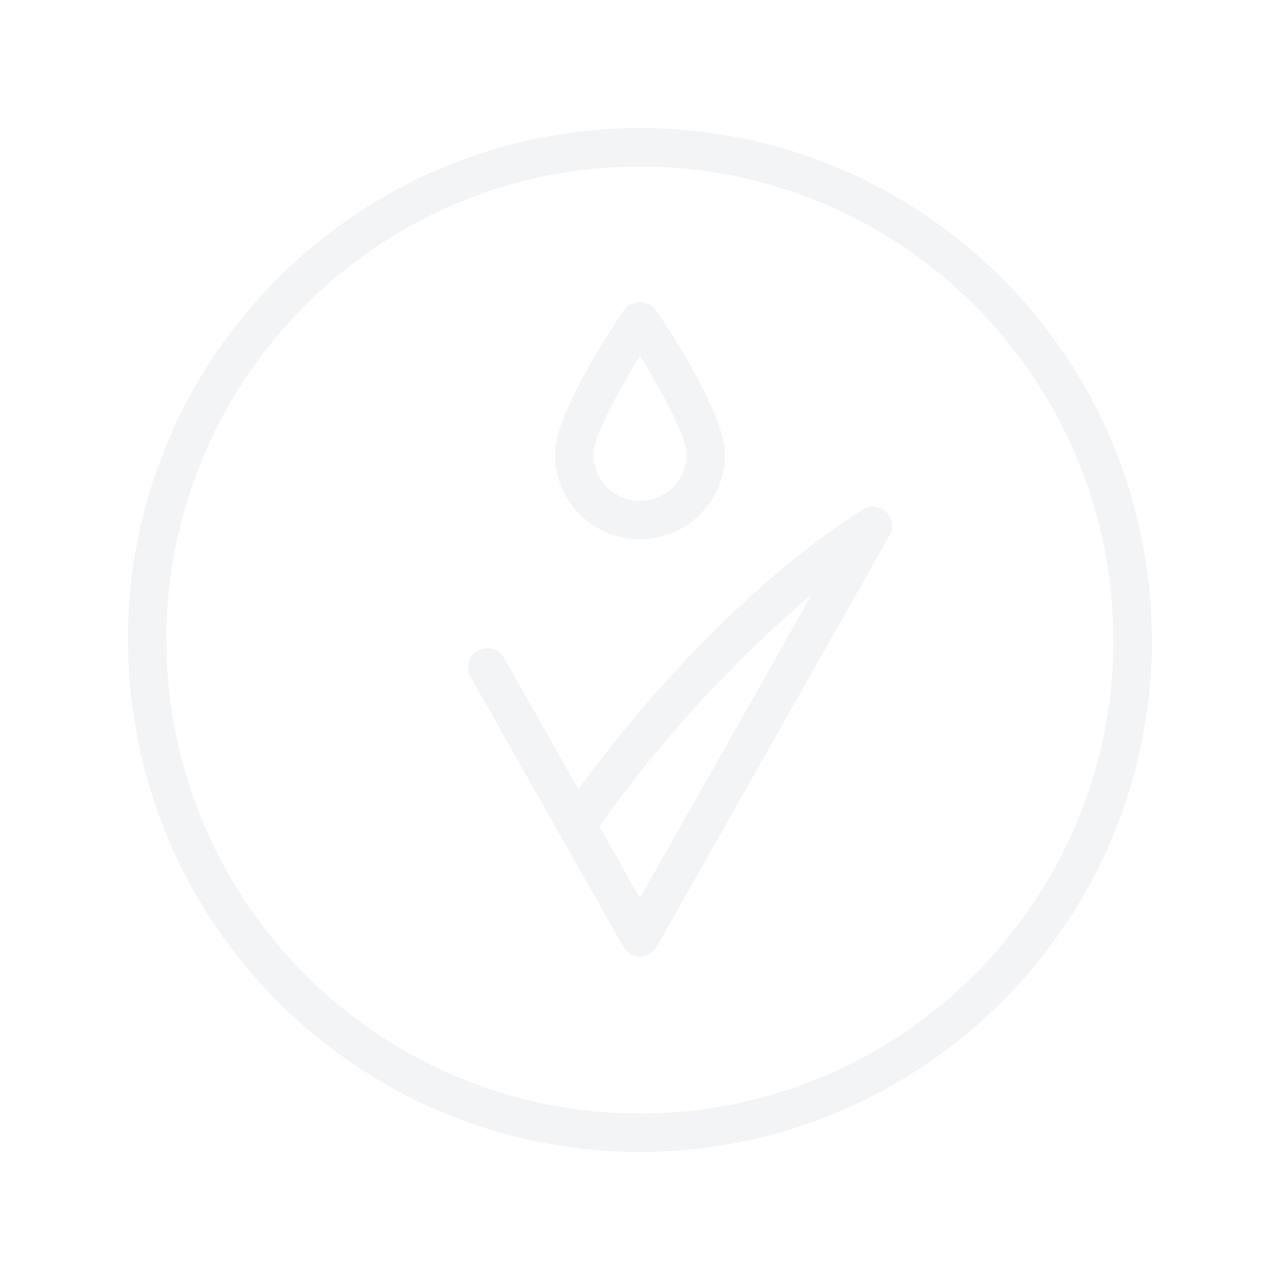 IDUN Minerals Quattro Eyeshadow Lejongap 4g